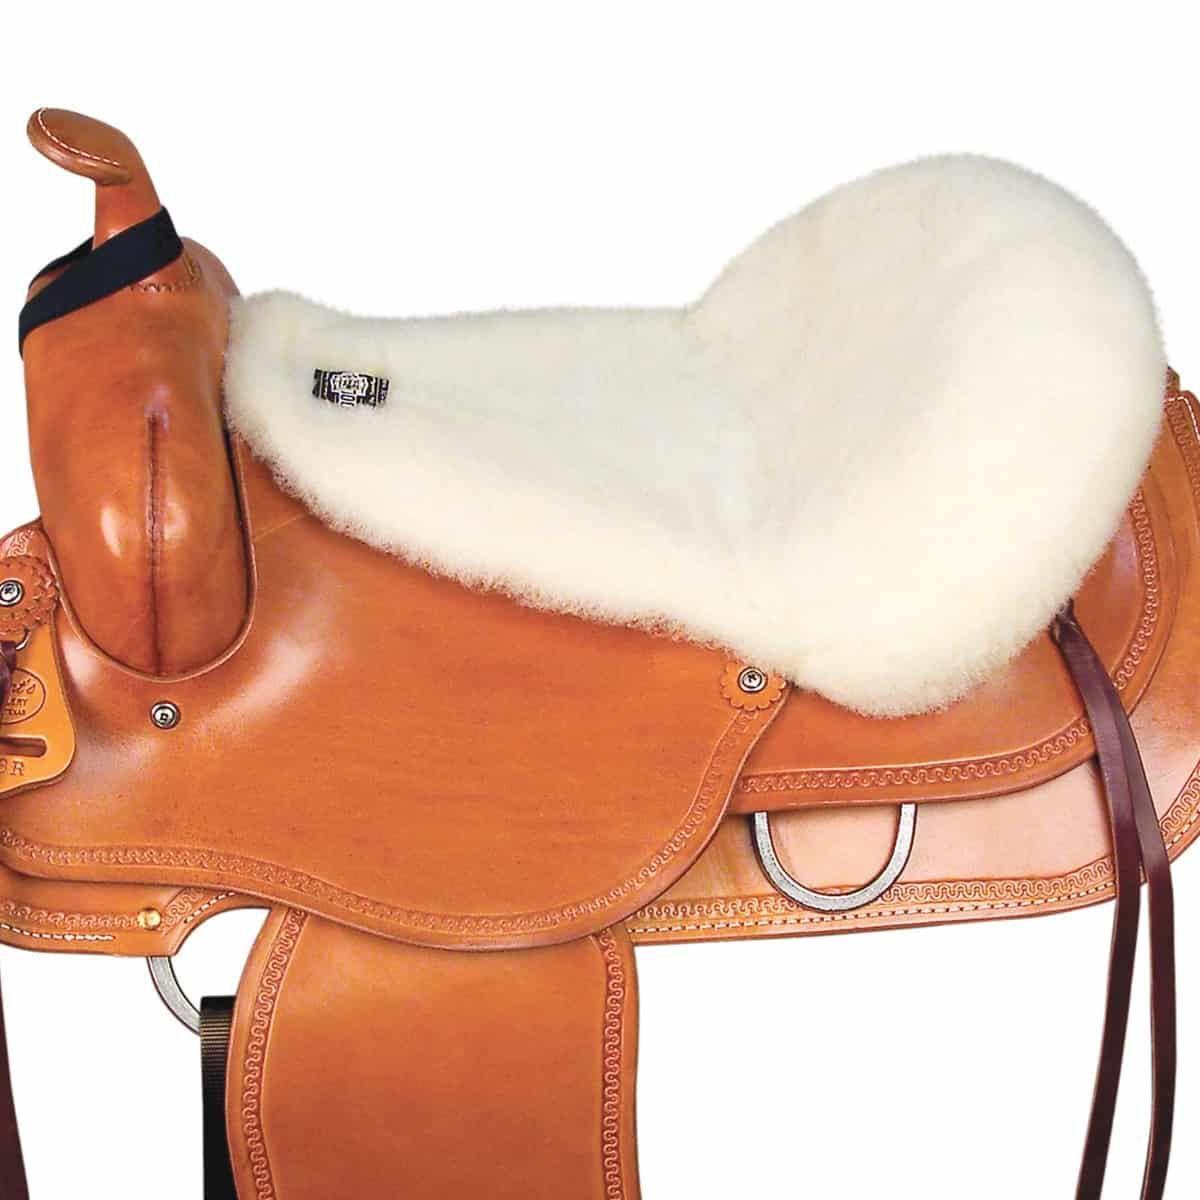 seat saver cowgirl magazine